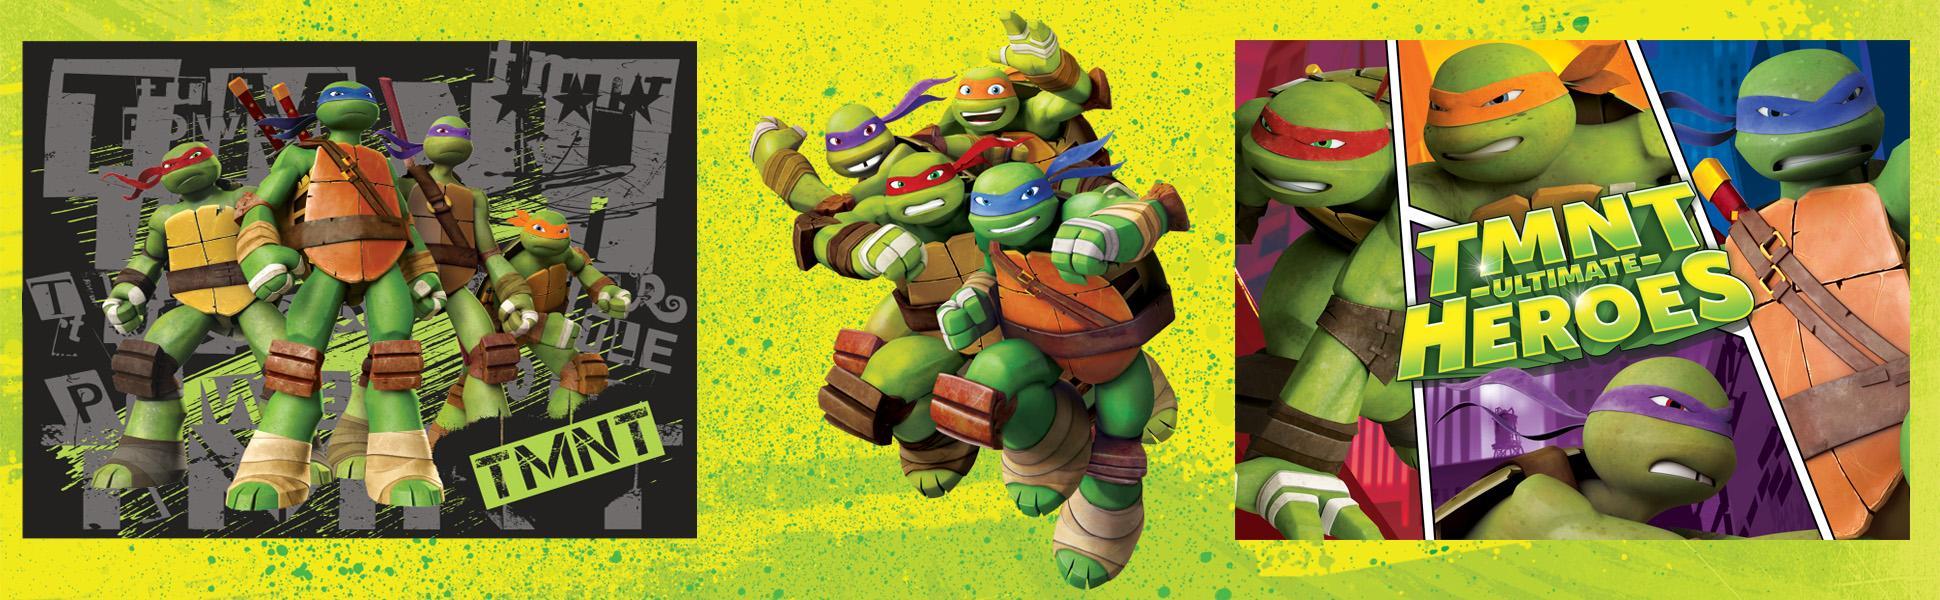 Gertmenian Nickelodeon Ninja Turtles Toys Rug Bedding Wall Decals TMNT Game Rugs w/ Disk Launcher + 4 Standees, 32